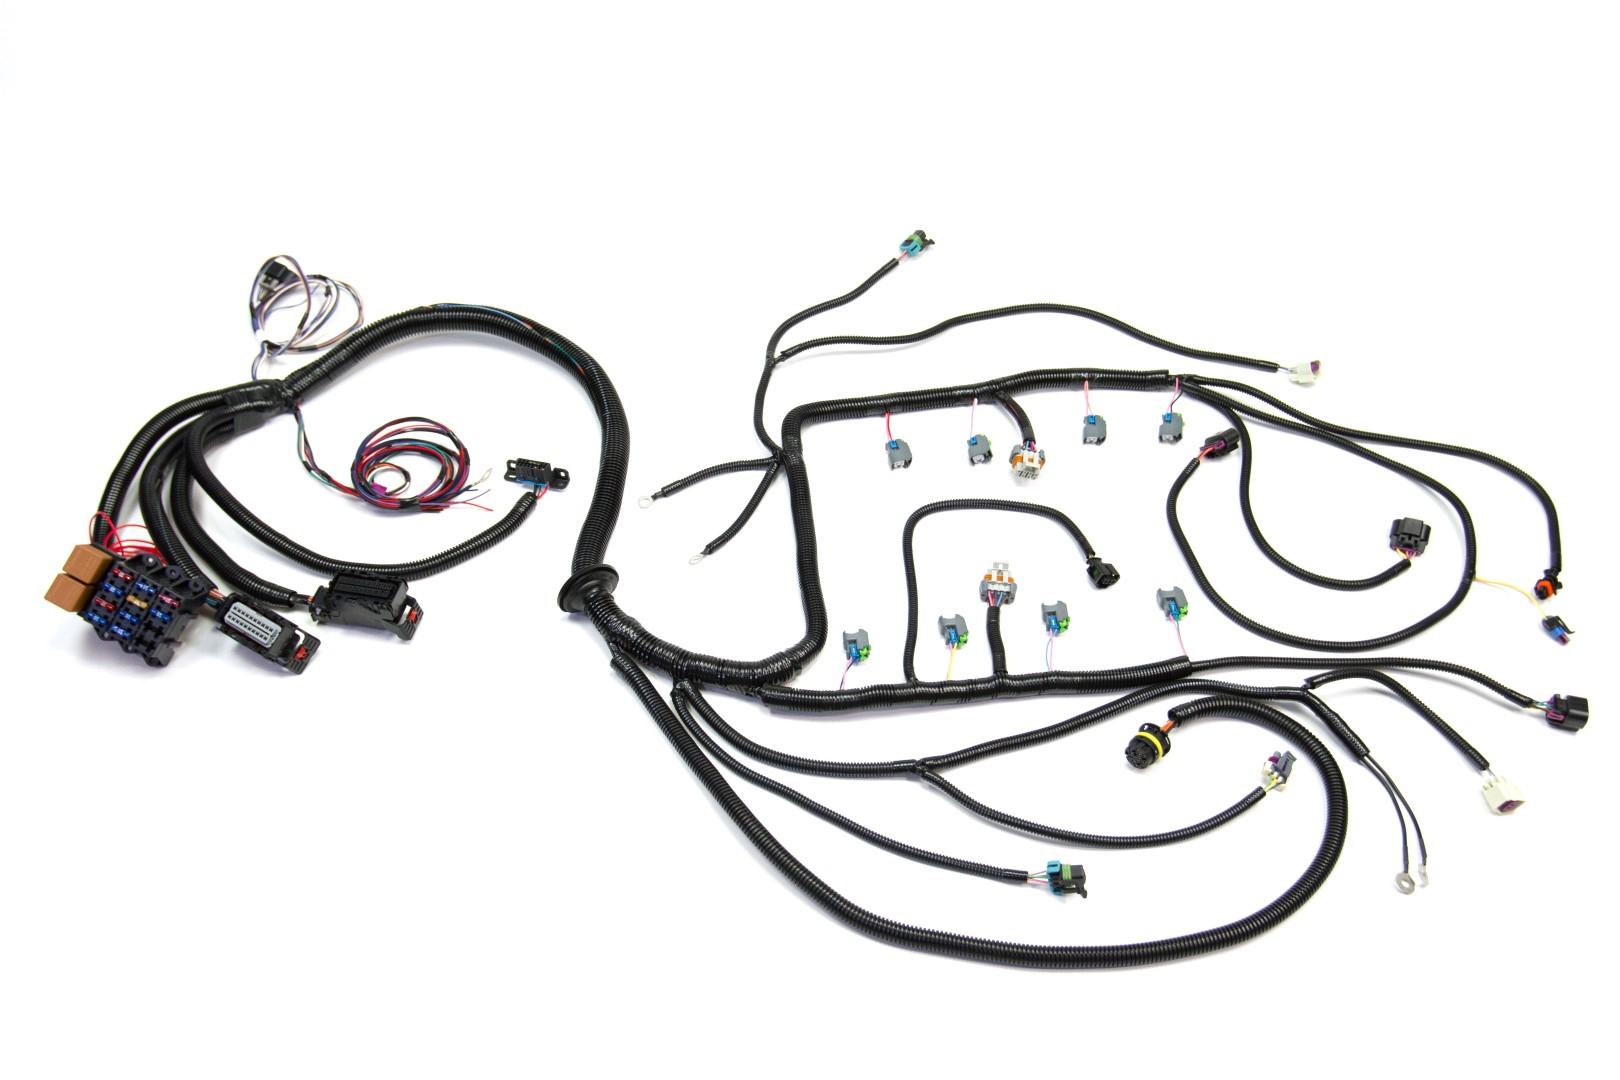 6 0 Wiring Harness Recall